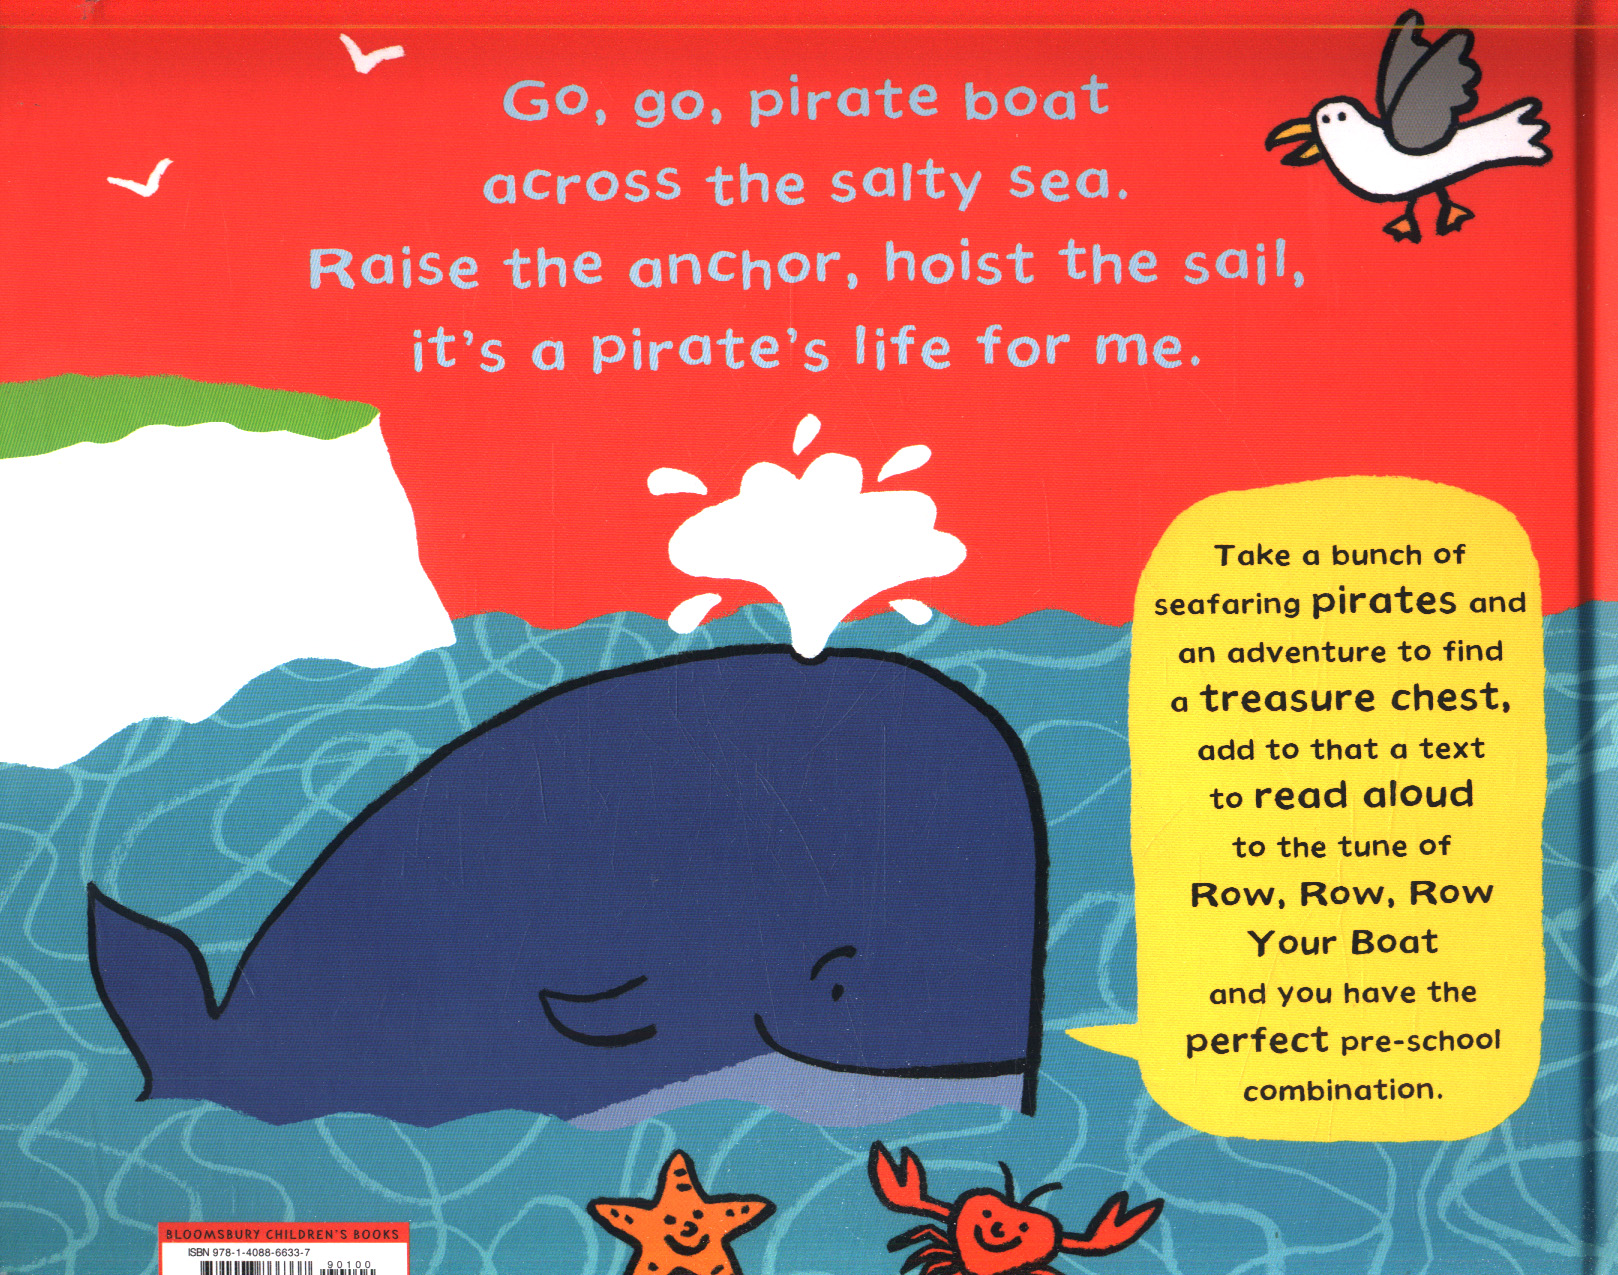 Go, go, pirate boat by Charman, Katrina (9781408866337